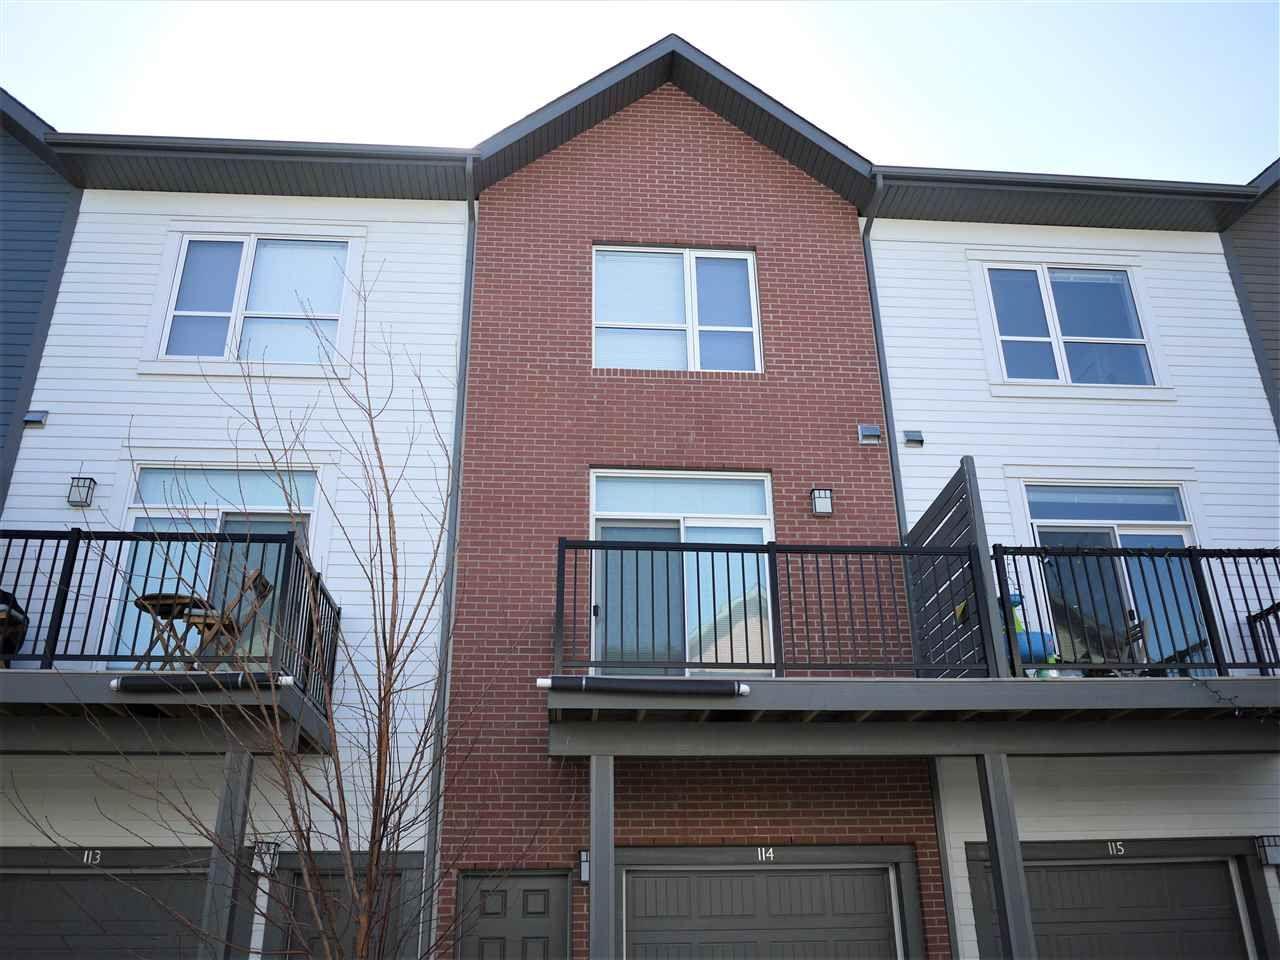 Main Photo: 114 2560 Pegasus in Edmonton: Zone 27 Townhouse for sale : MLS®# E4236412